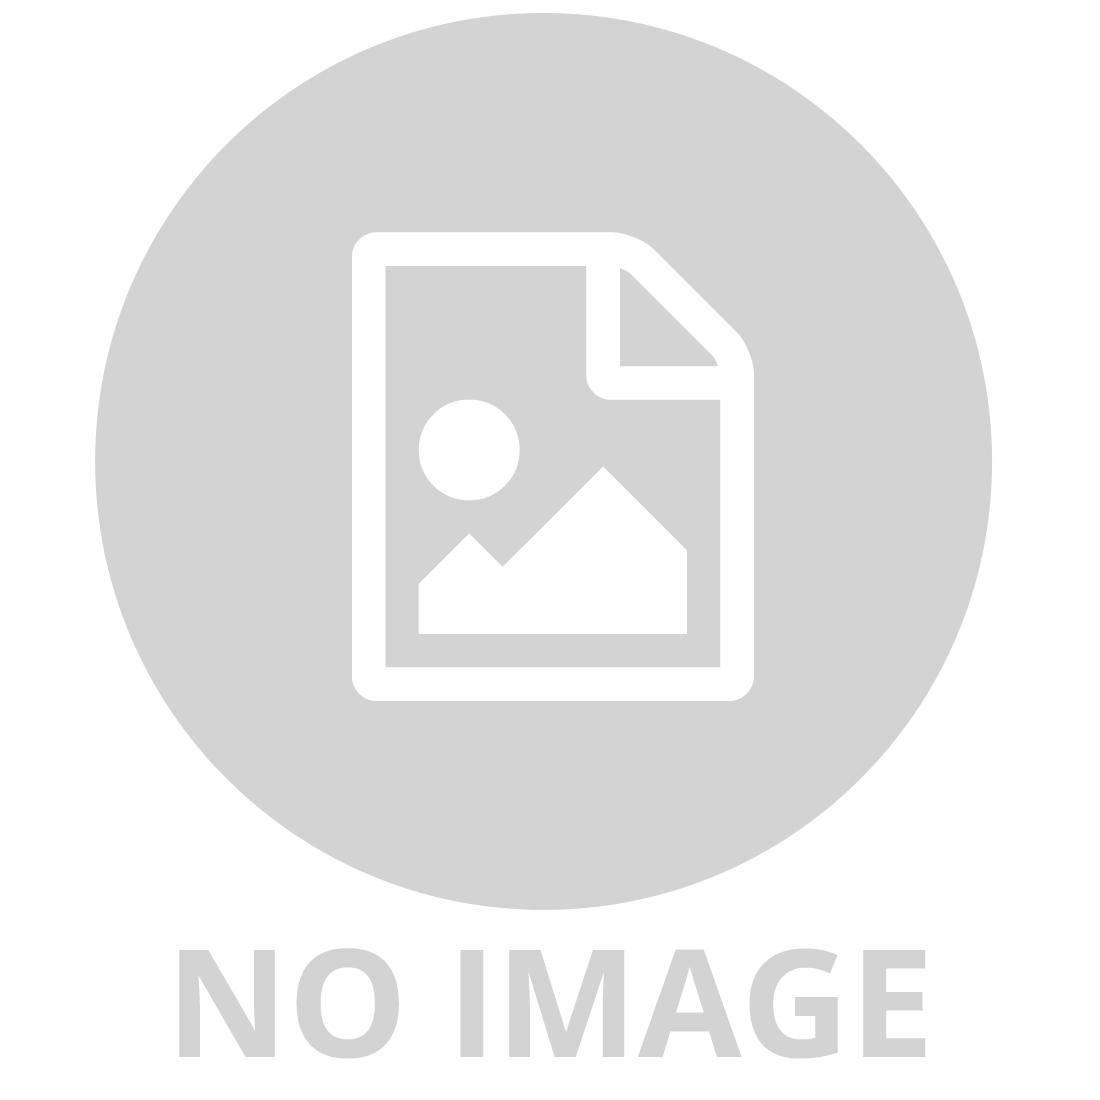 BRIO WOODEN RAILWAY SPEEDY BULLET TRAIN